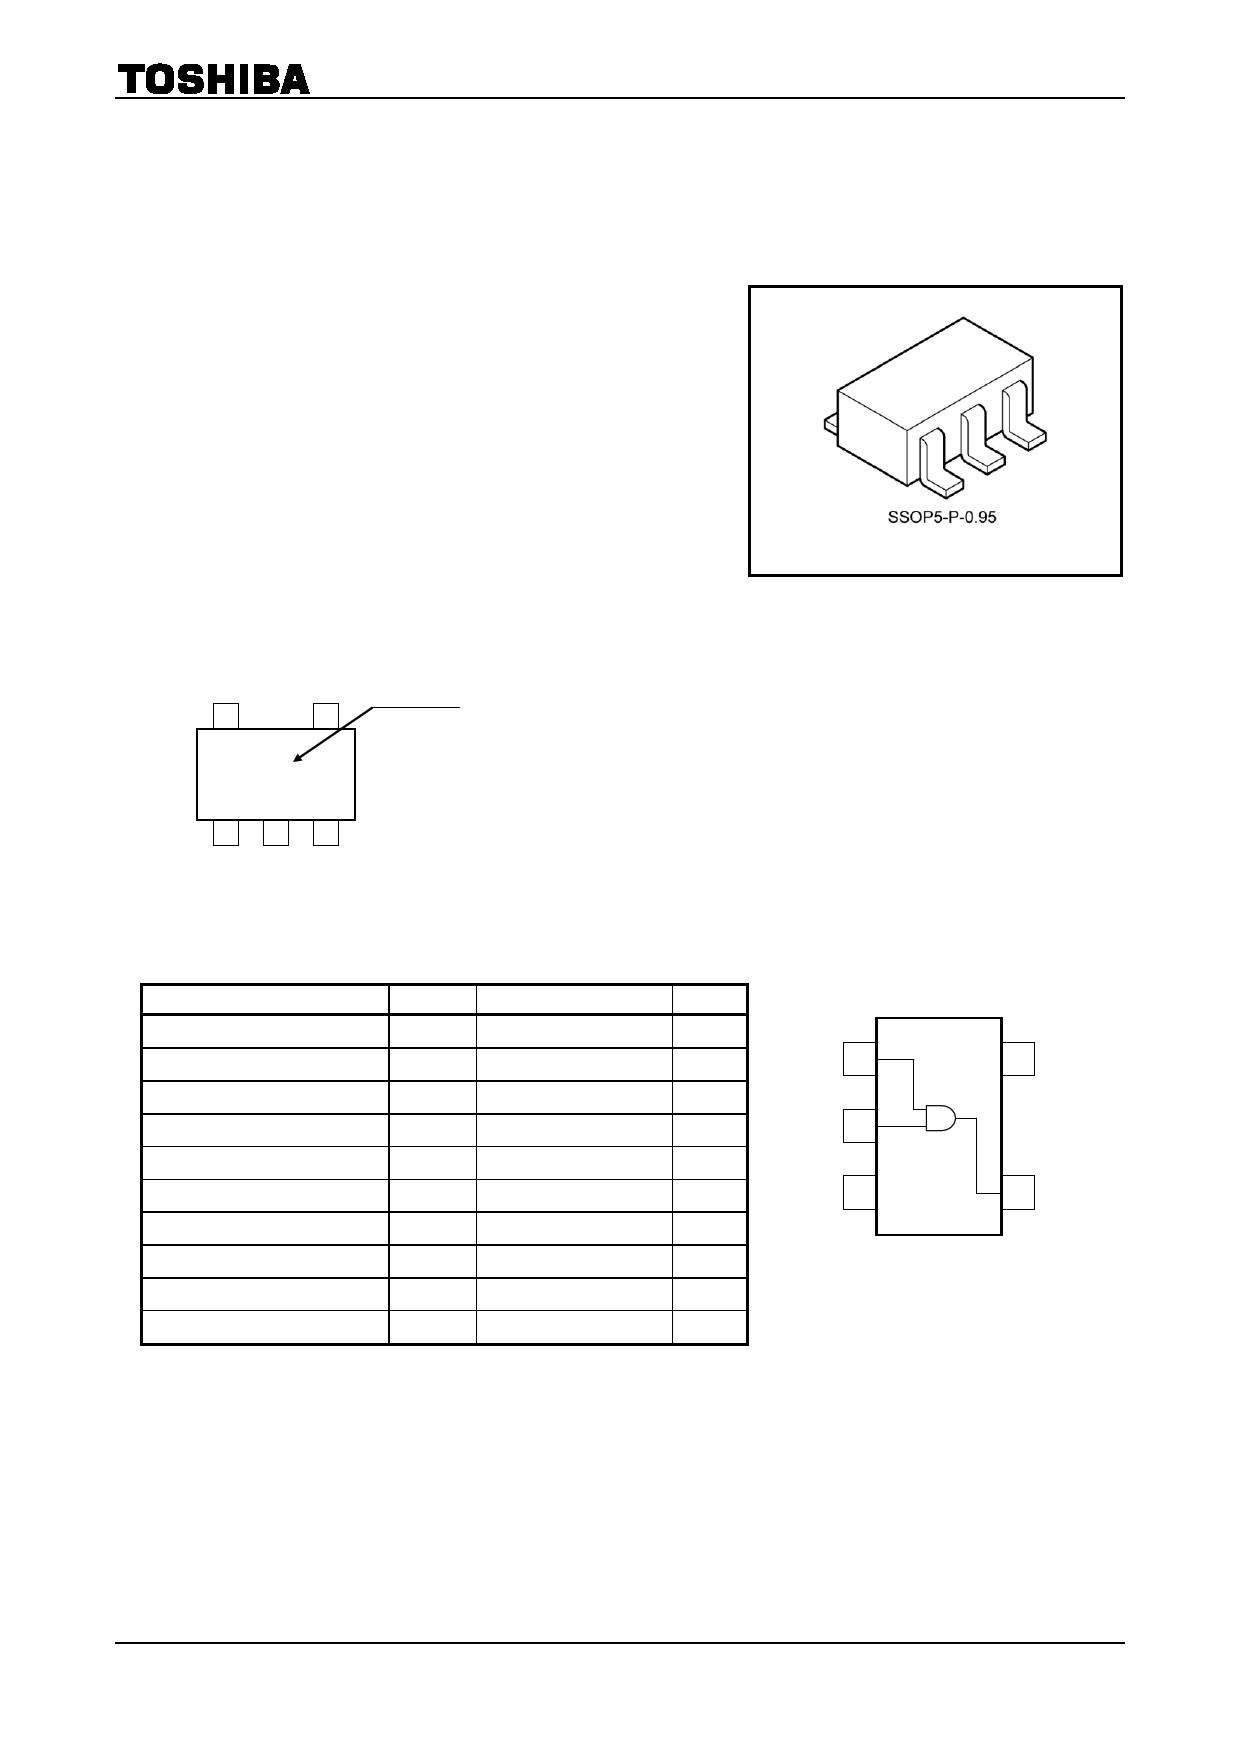 TC7SH09F 데이터시트 및 TC7SH09F PDF